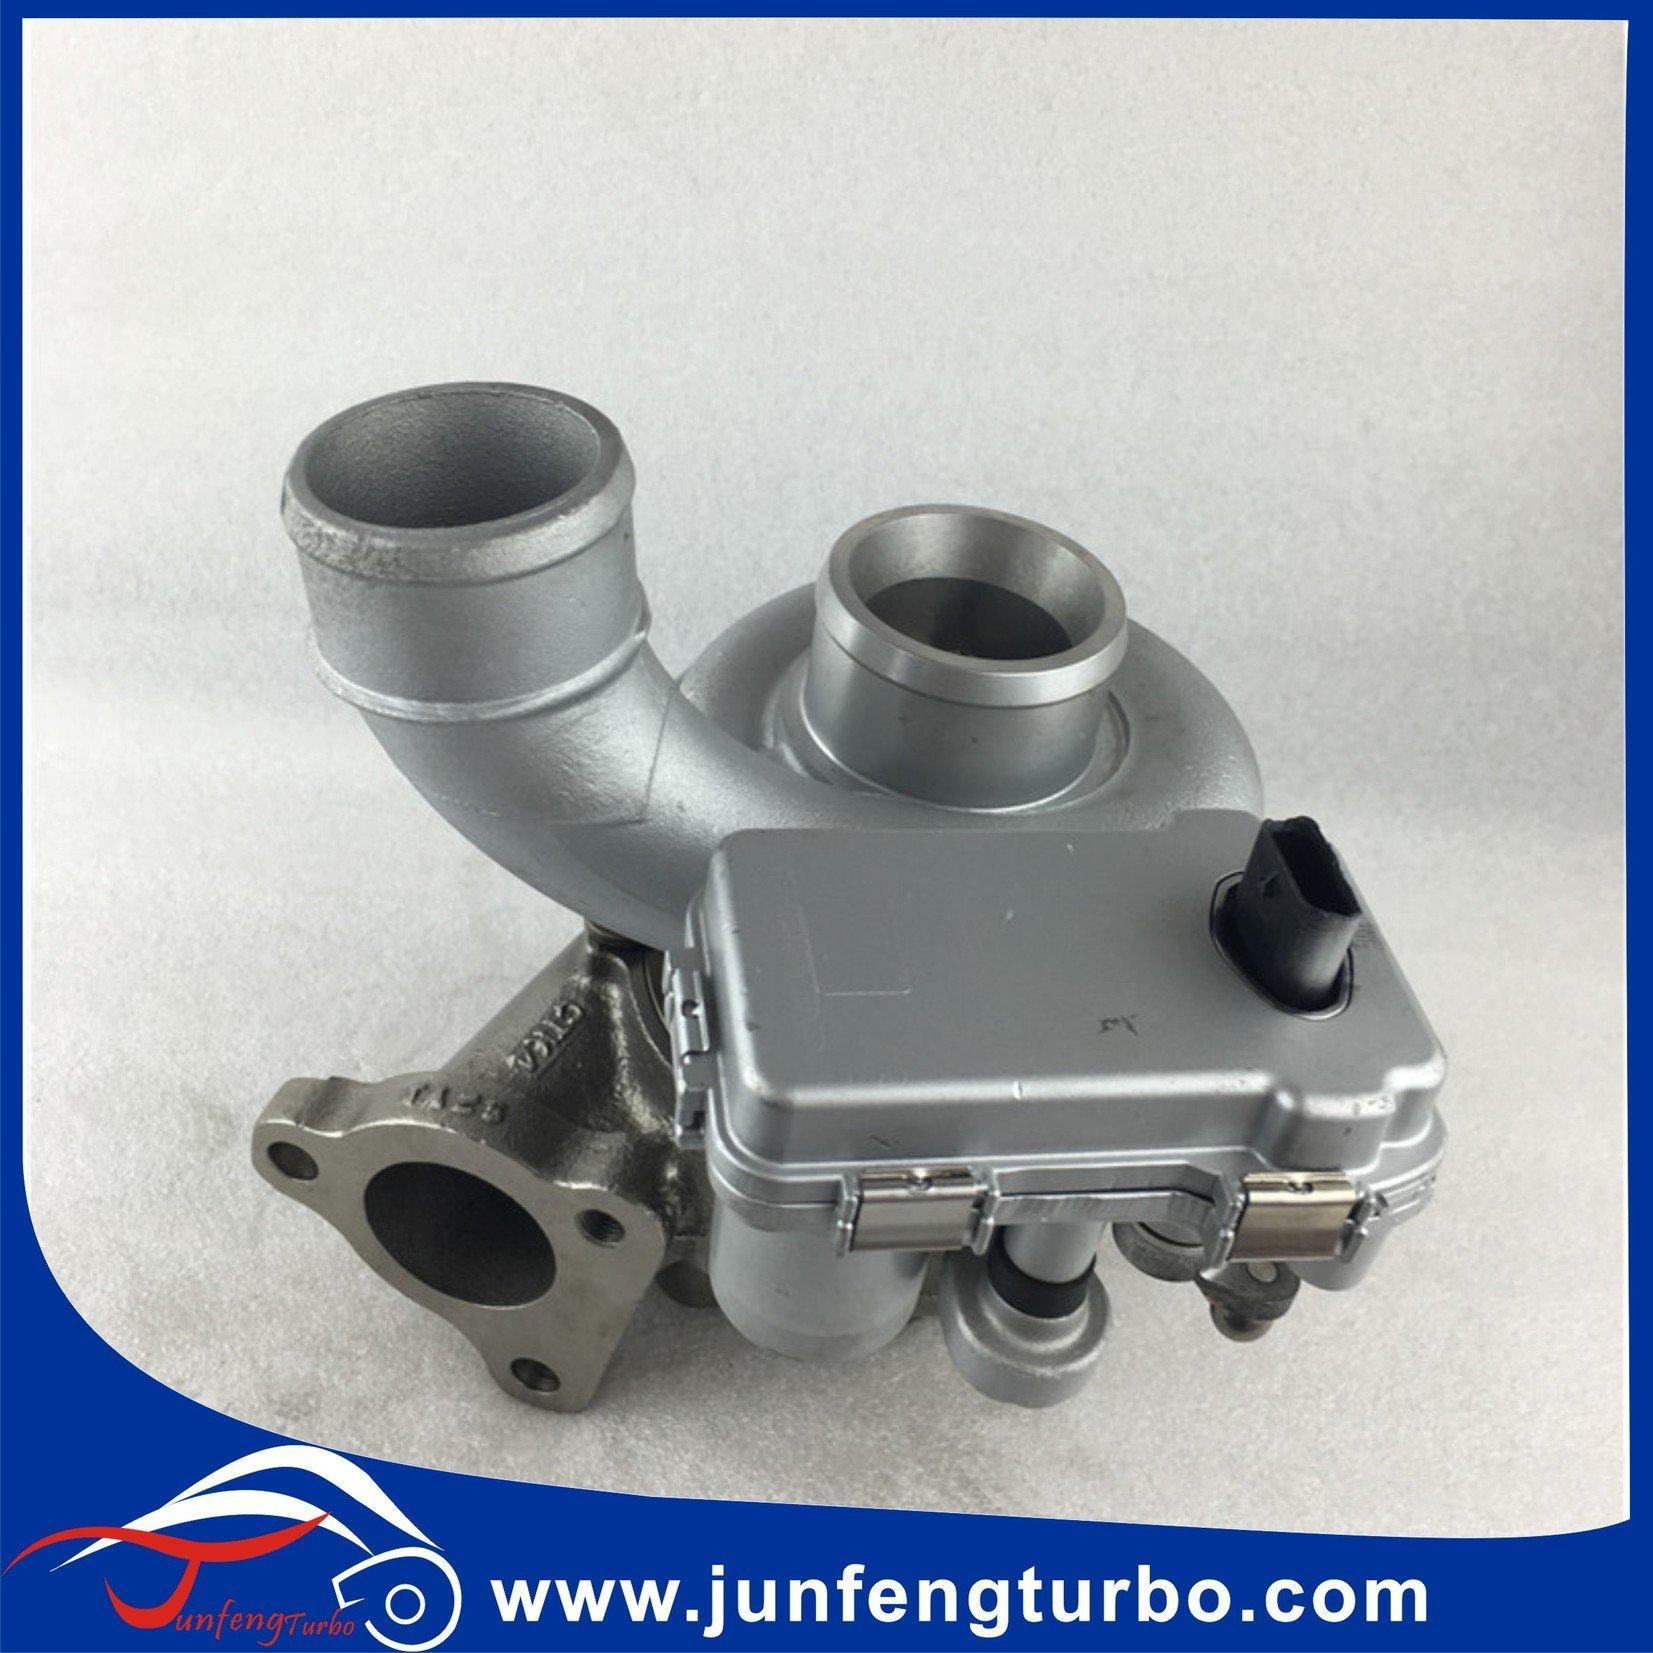 BV39 Hyundai turbo 28231-2F300 54399880107 turbo 54399700107 D4EAV-D4EAF